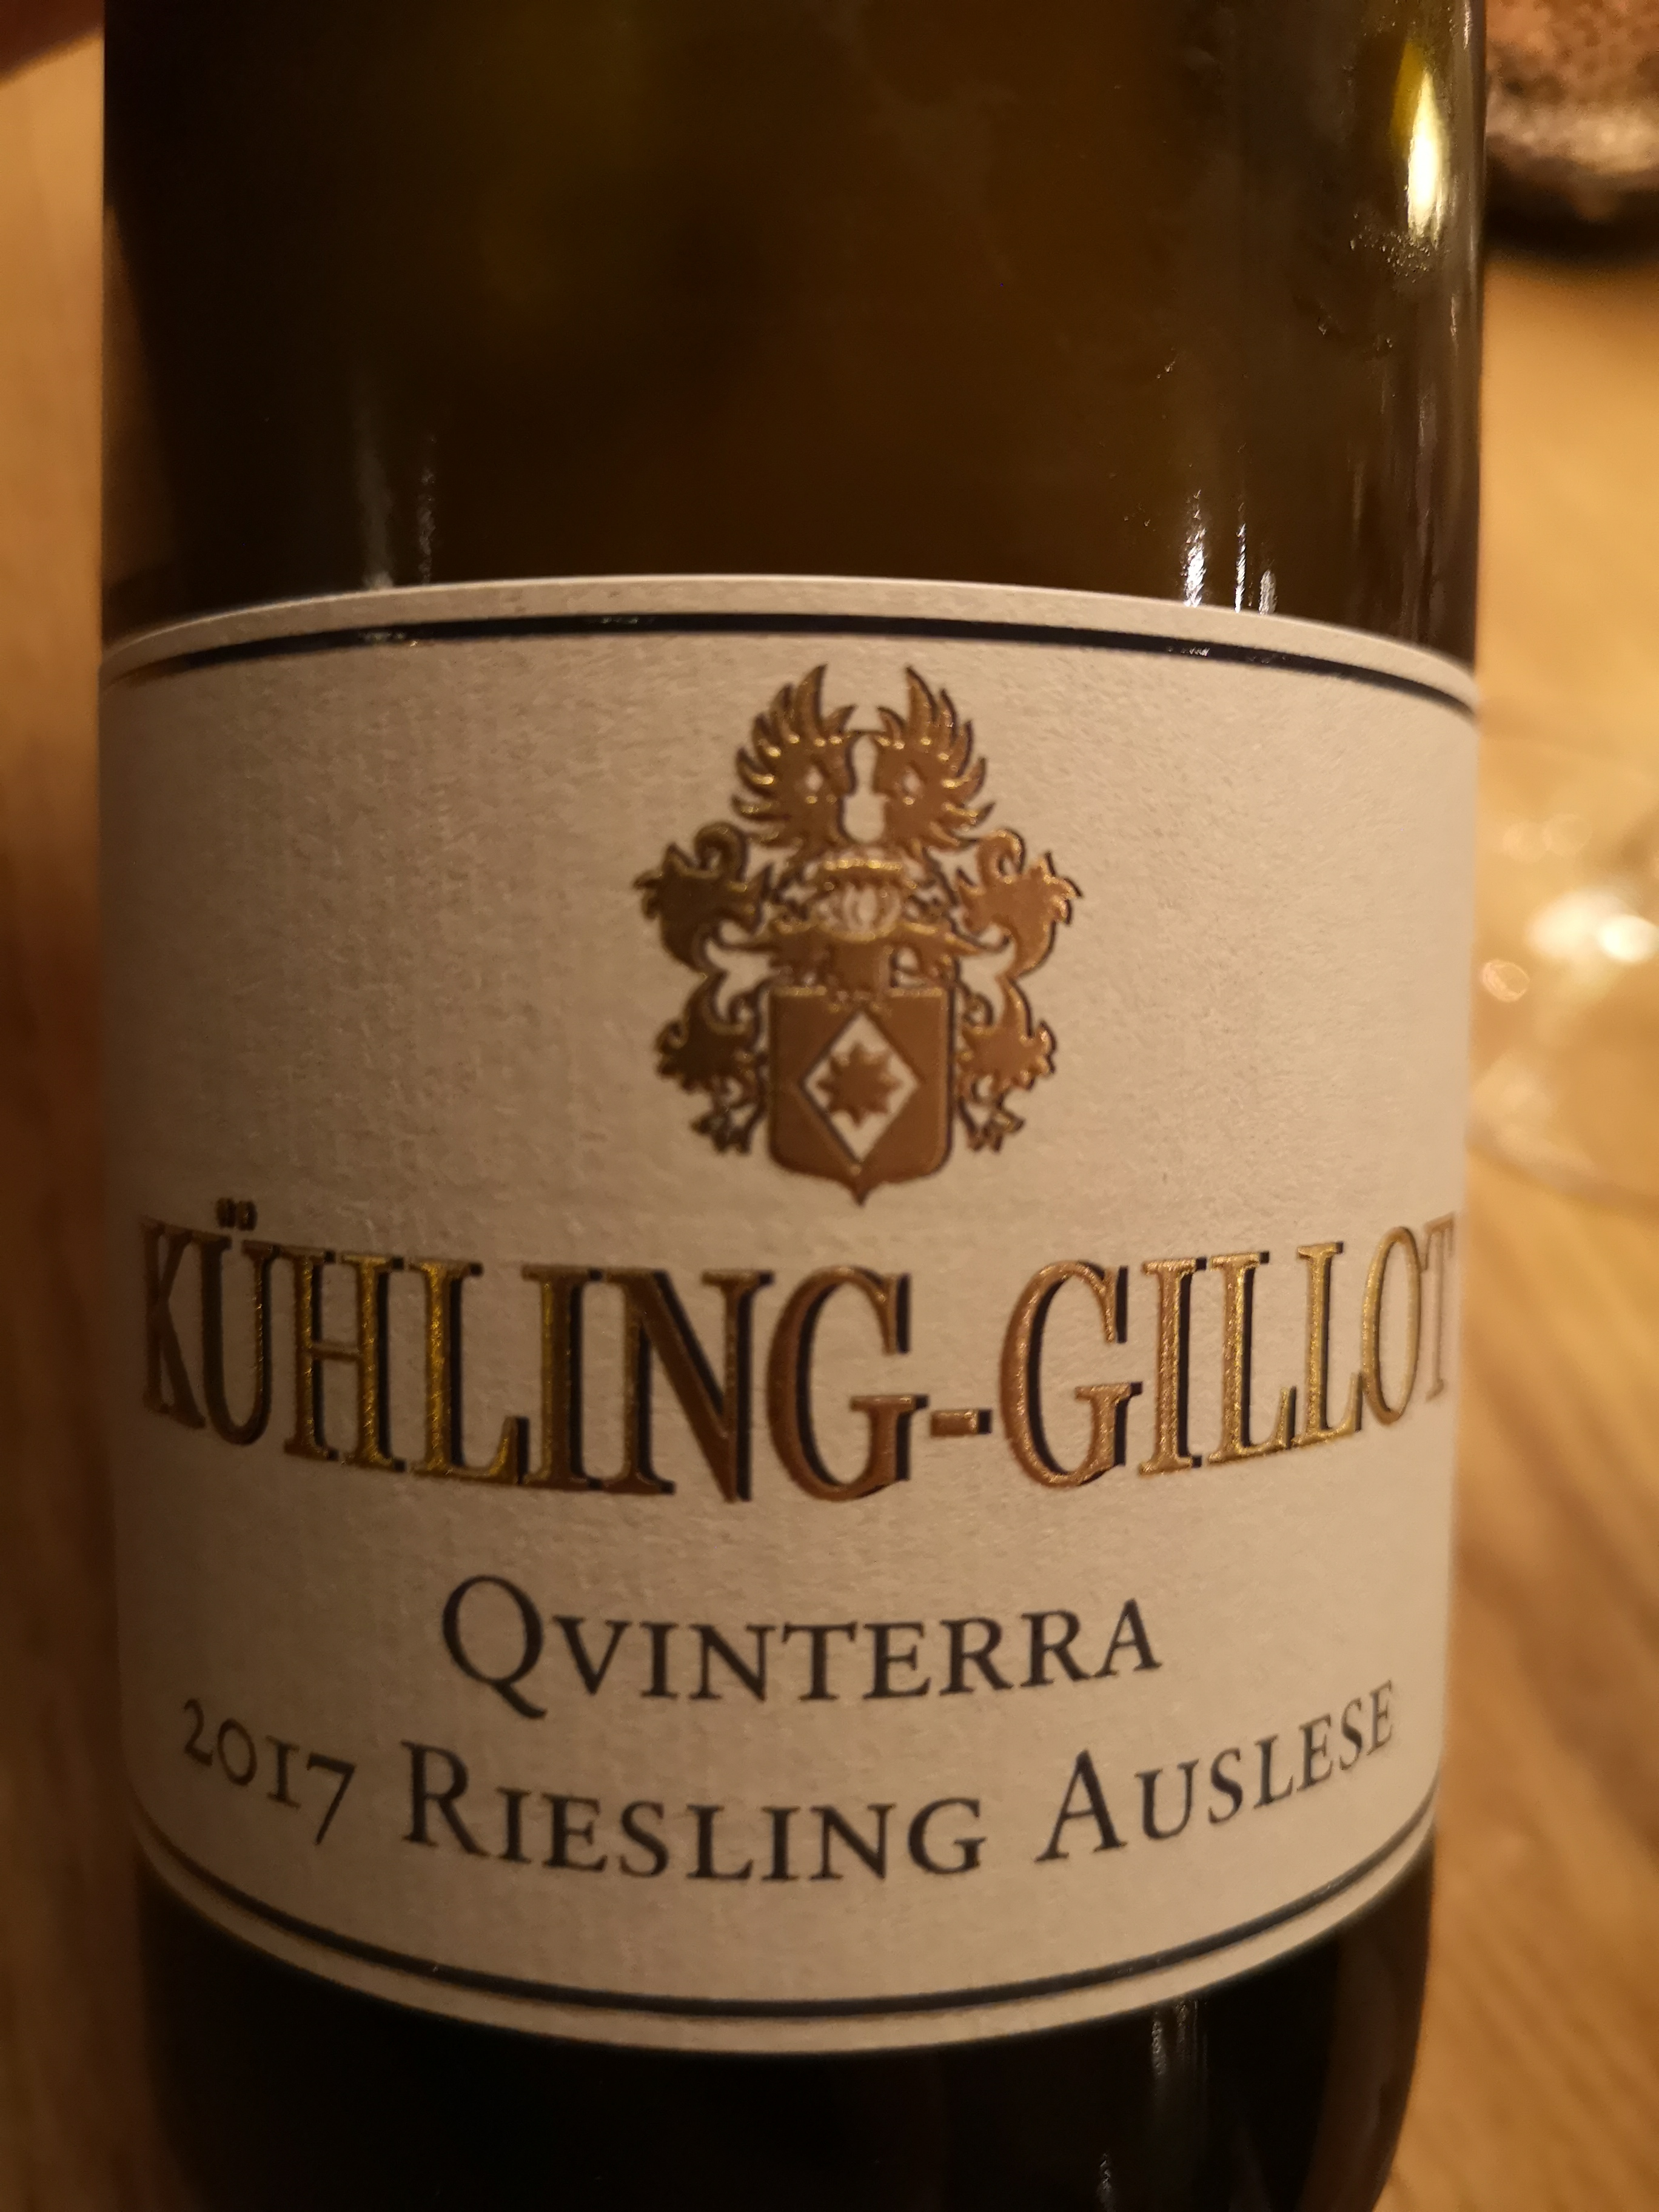 2017 Riesling Auslese Qvinterra | Kühling-Gillot